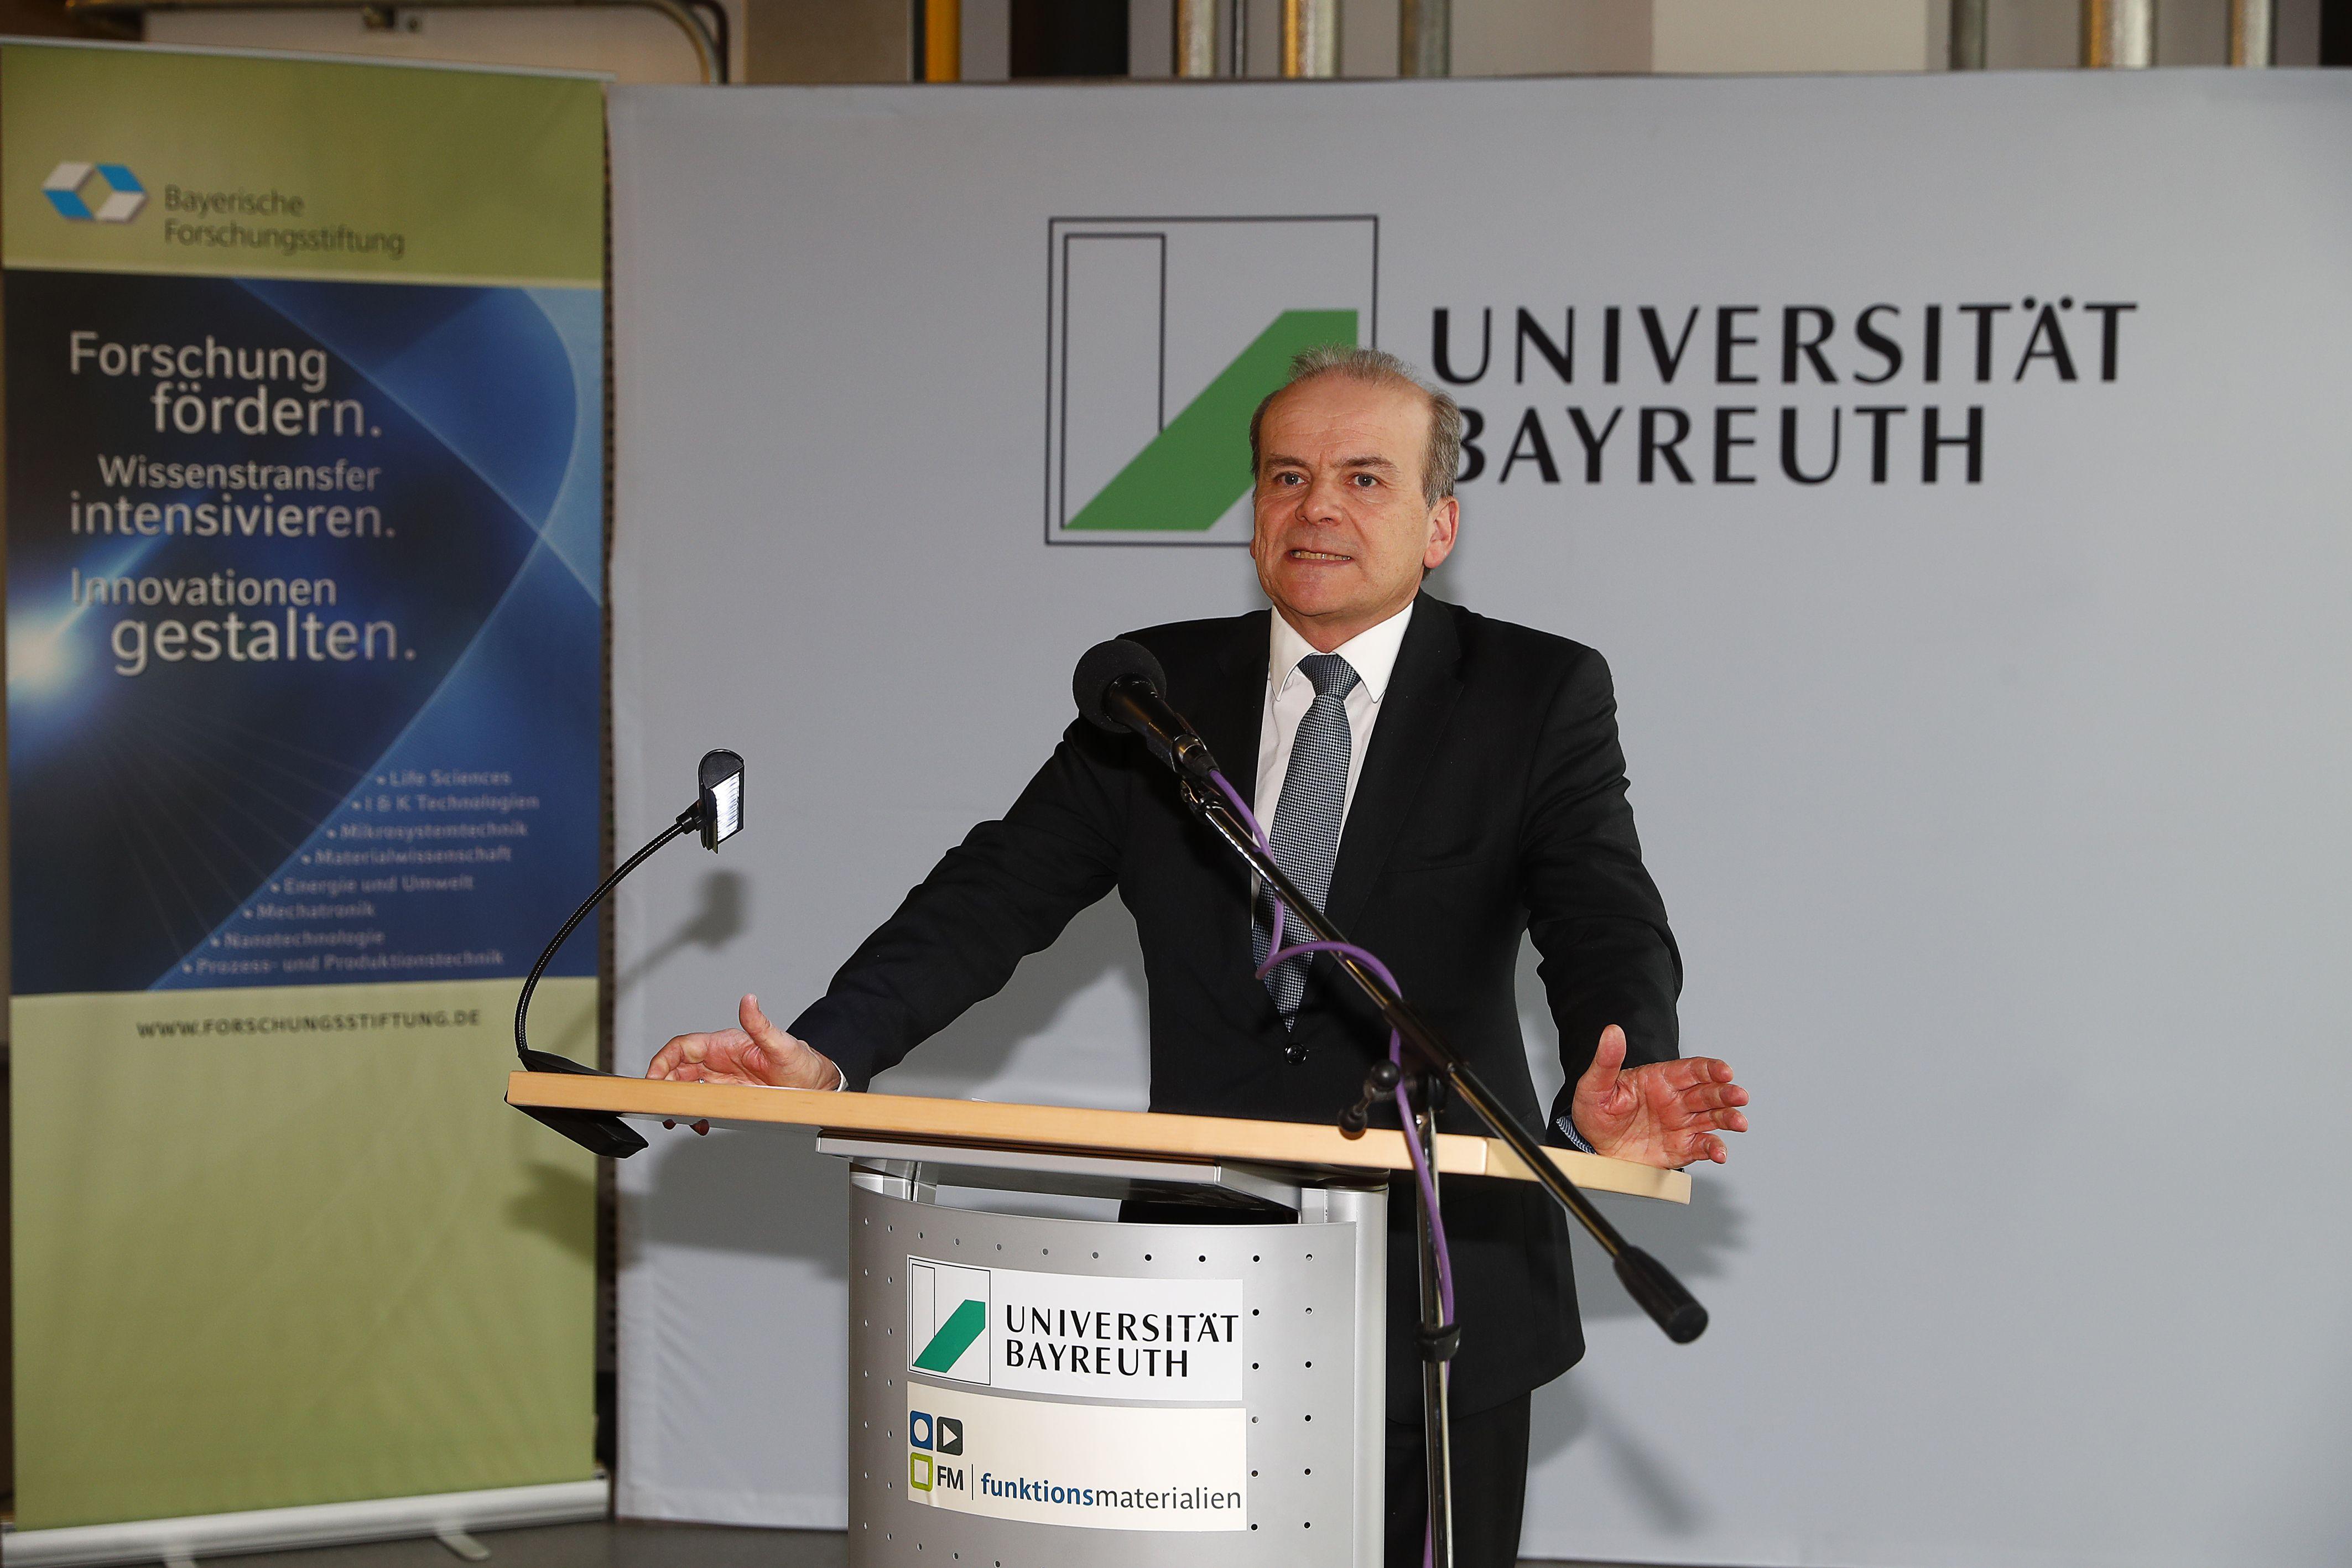 Ministerialdirektor Dr. Rolf-Dieter Jungk an der Universität Bayreuth